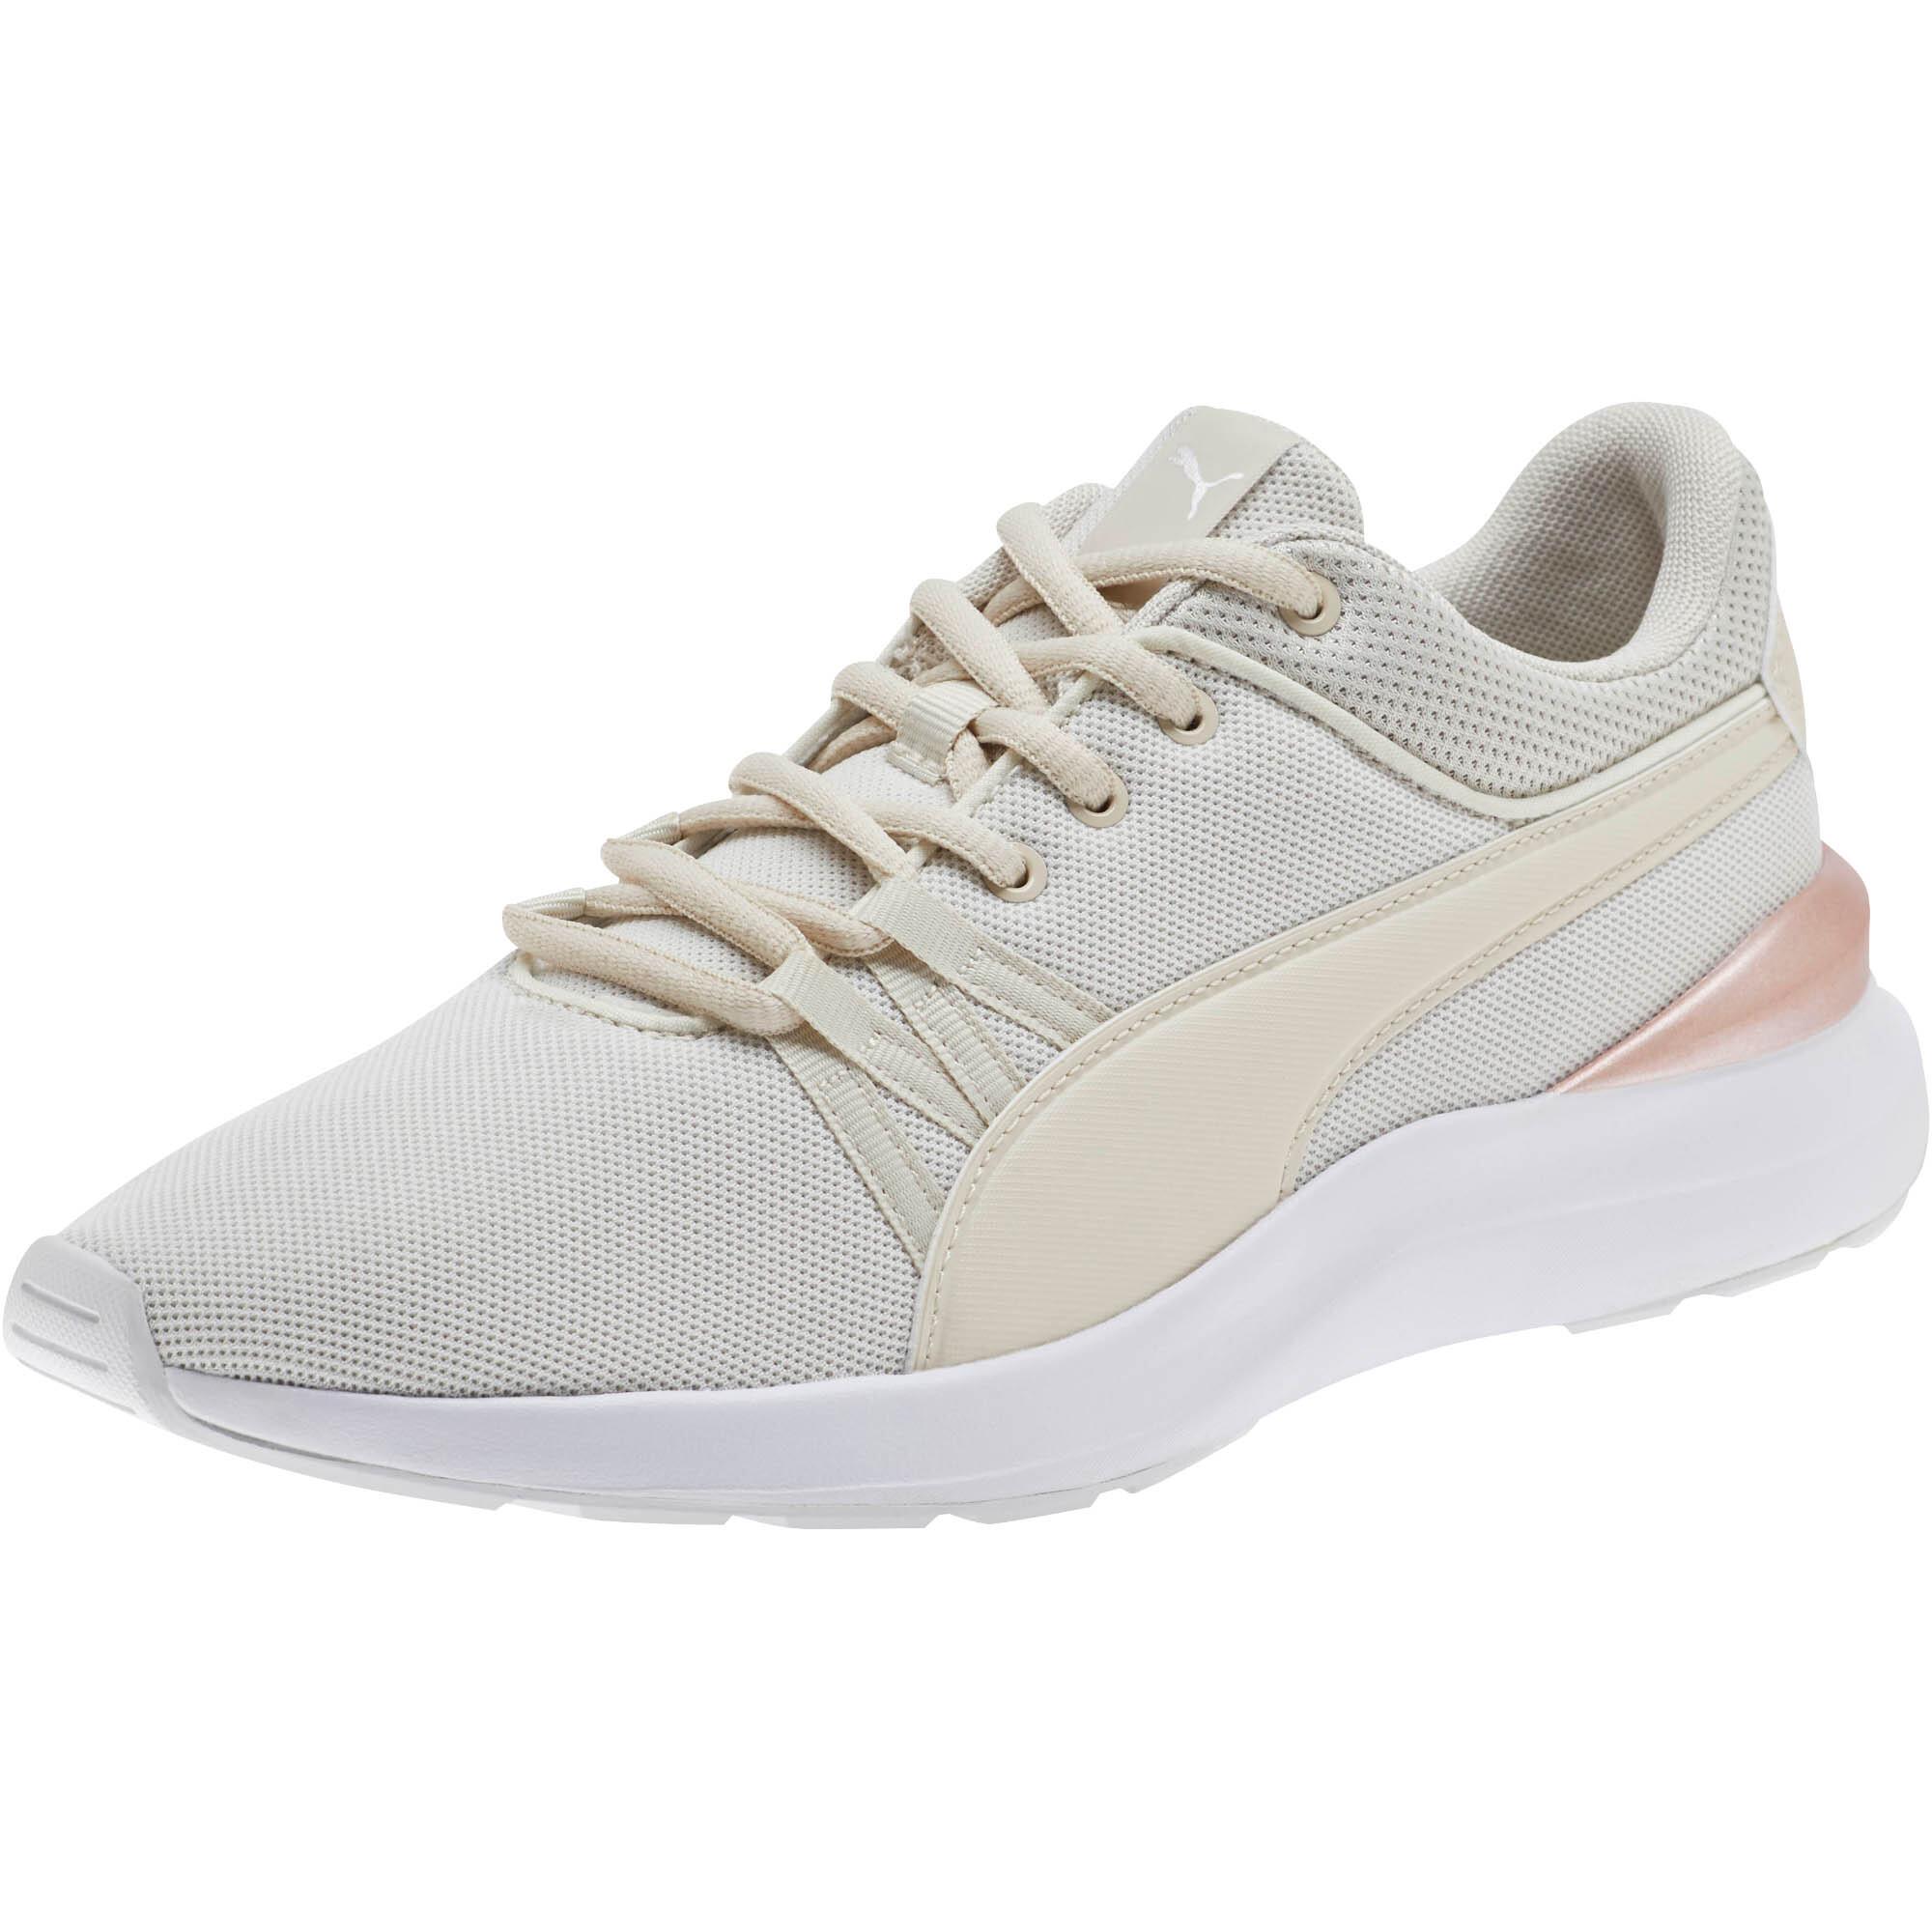 PUMA-Adela-Mesh-Women-s-Sneakers-Women-Shoe-Basics thumbnail 14